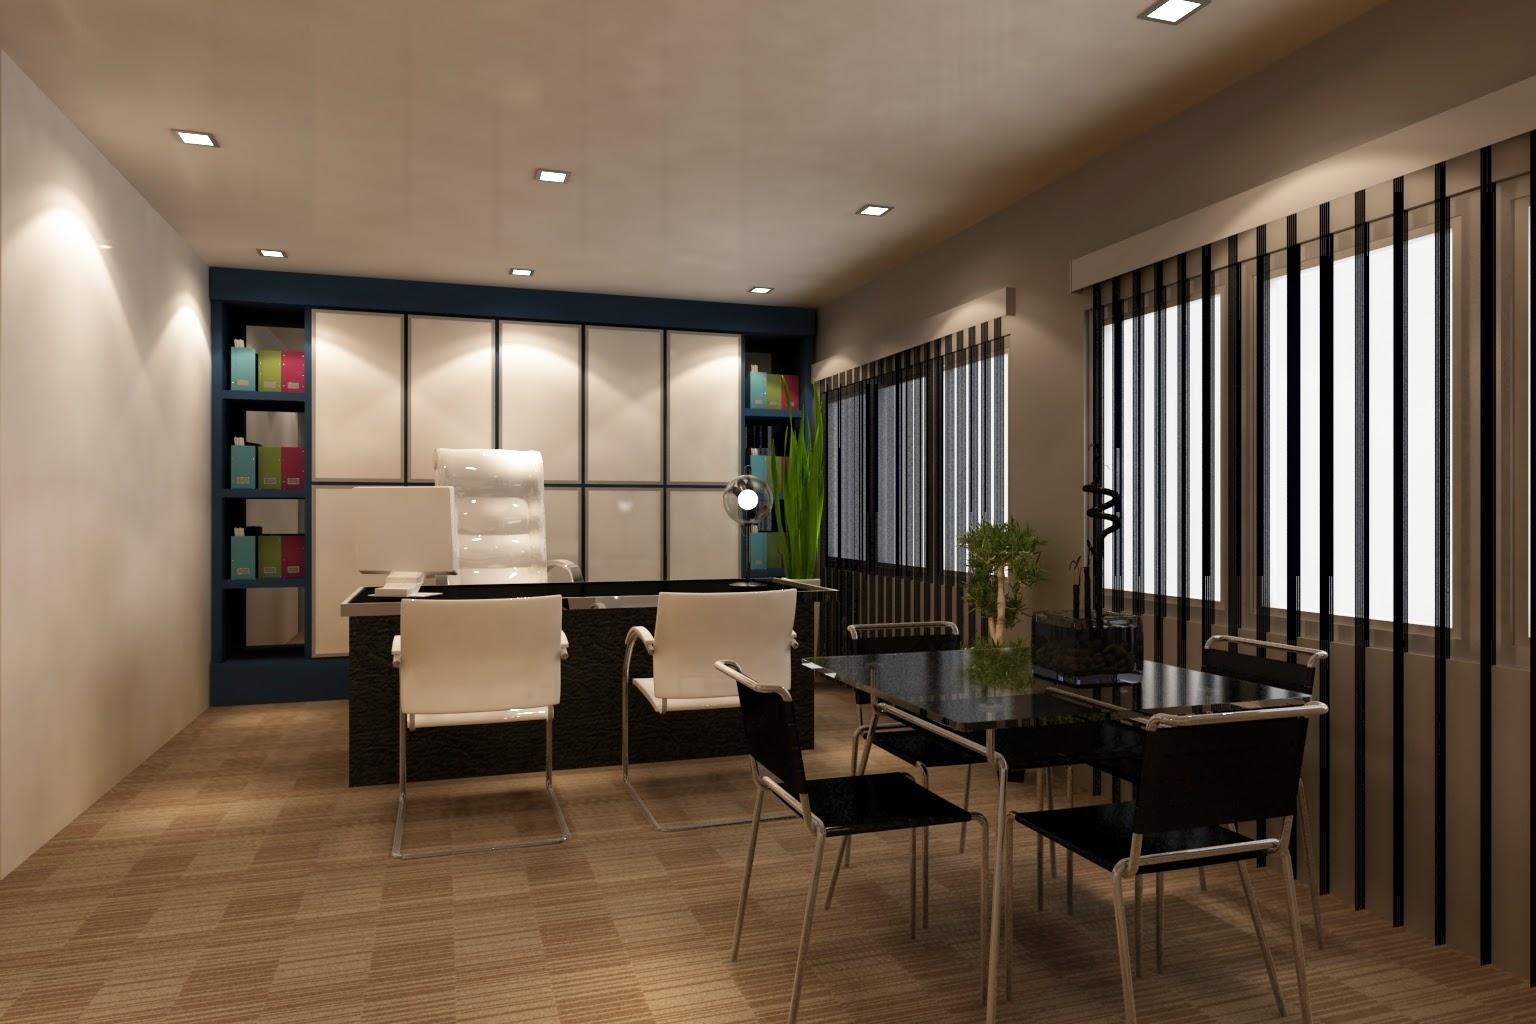 3d Home Decor Idea S: Foundation Dezin & Decor...: Office Space In 3D Model